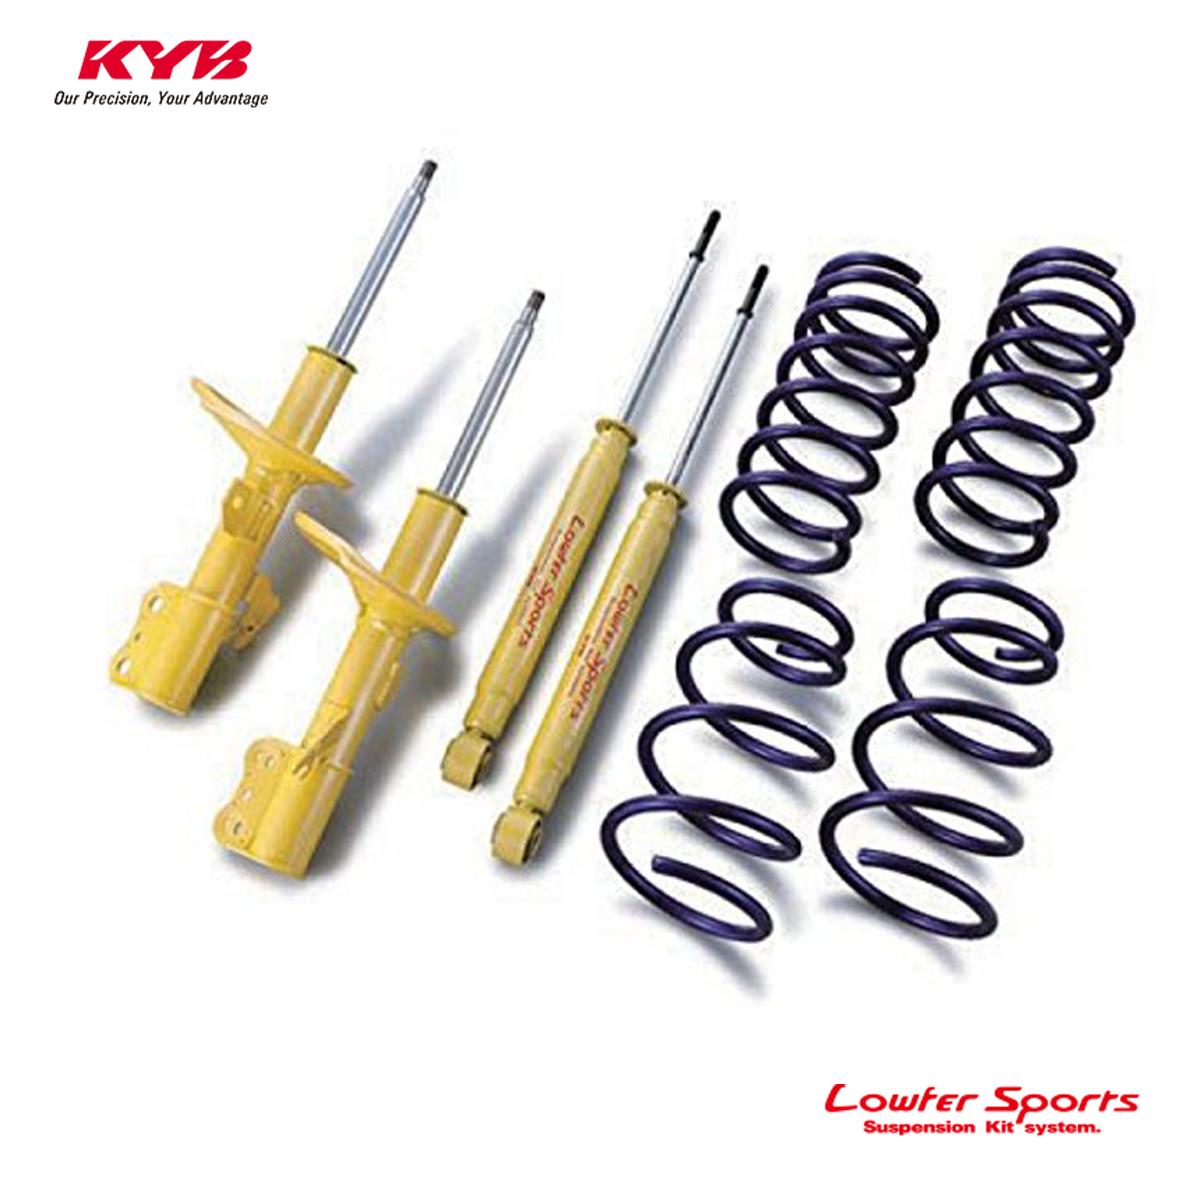 KYB カヤバ ステップワゴン RF3 ショックアブソーバー サスペンションキット Lowfer Sports LKIT-RF3 配送先条件有り